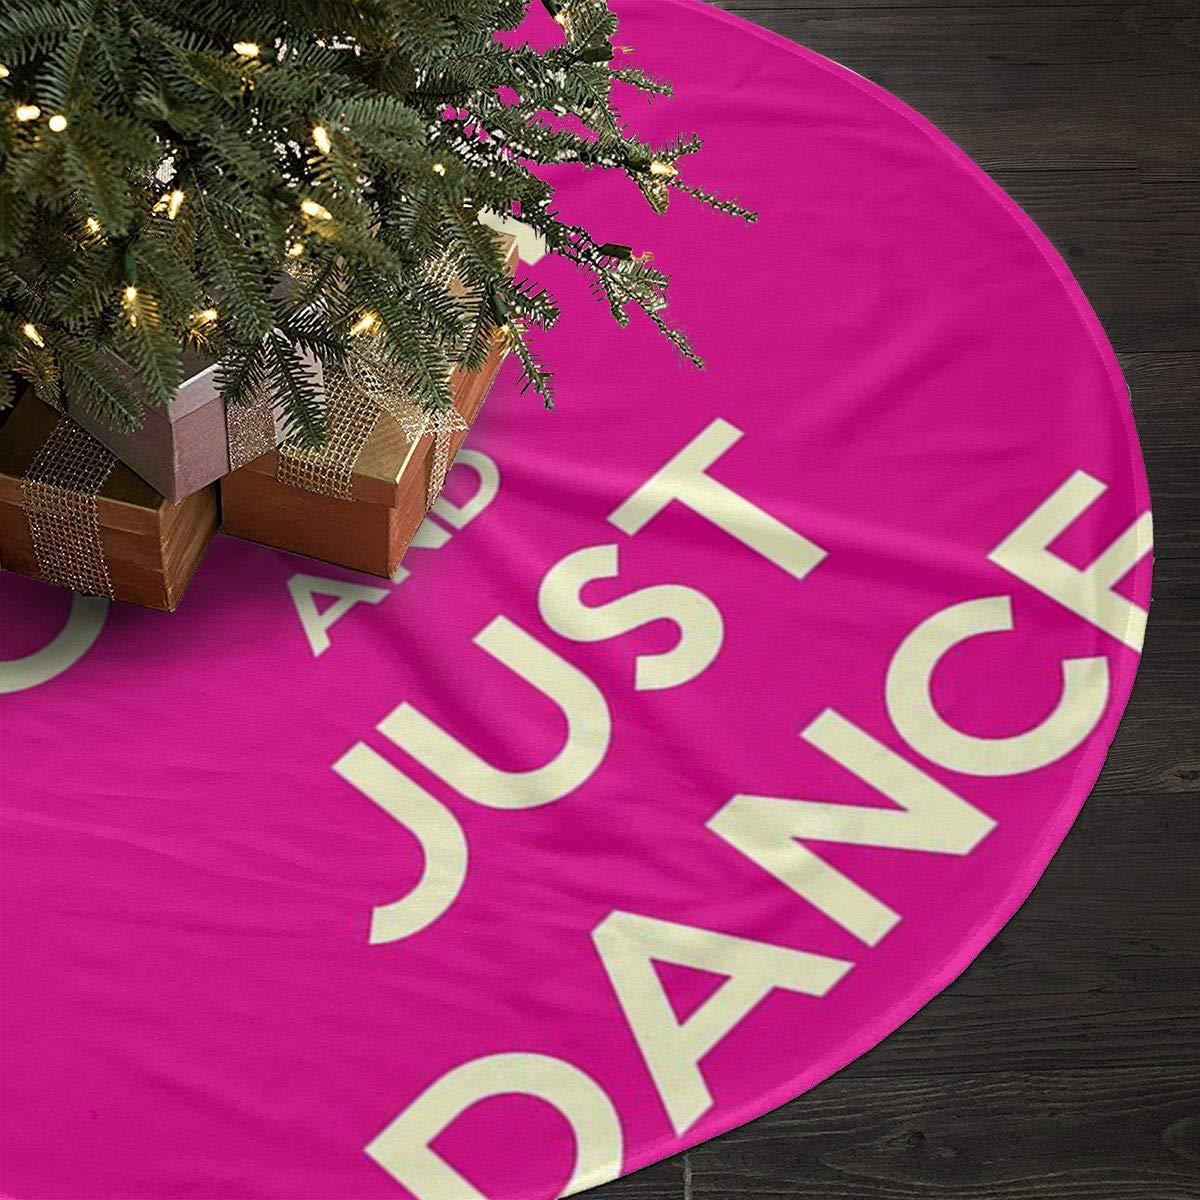 Amazon.com: HIFJDNM Christmas Tree Skirt with Keep Calm and Just ...